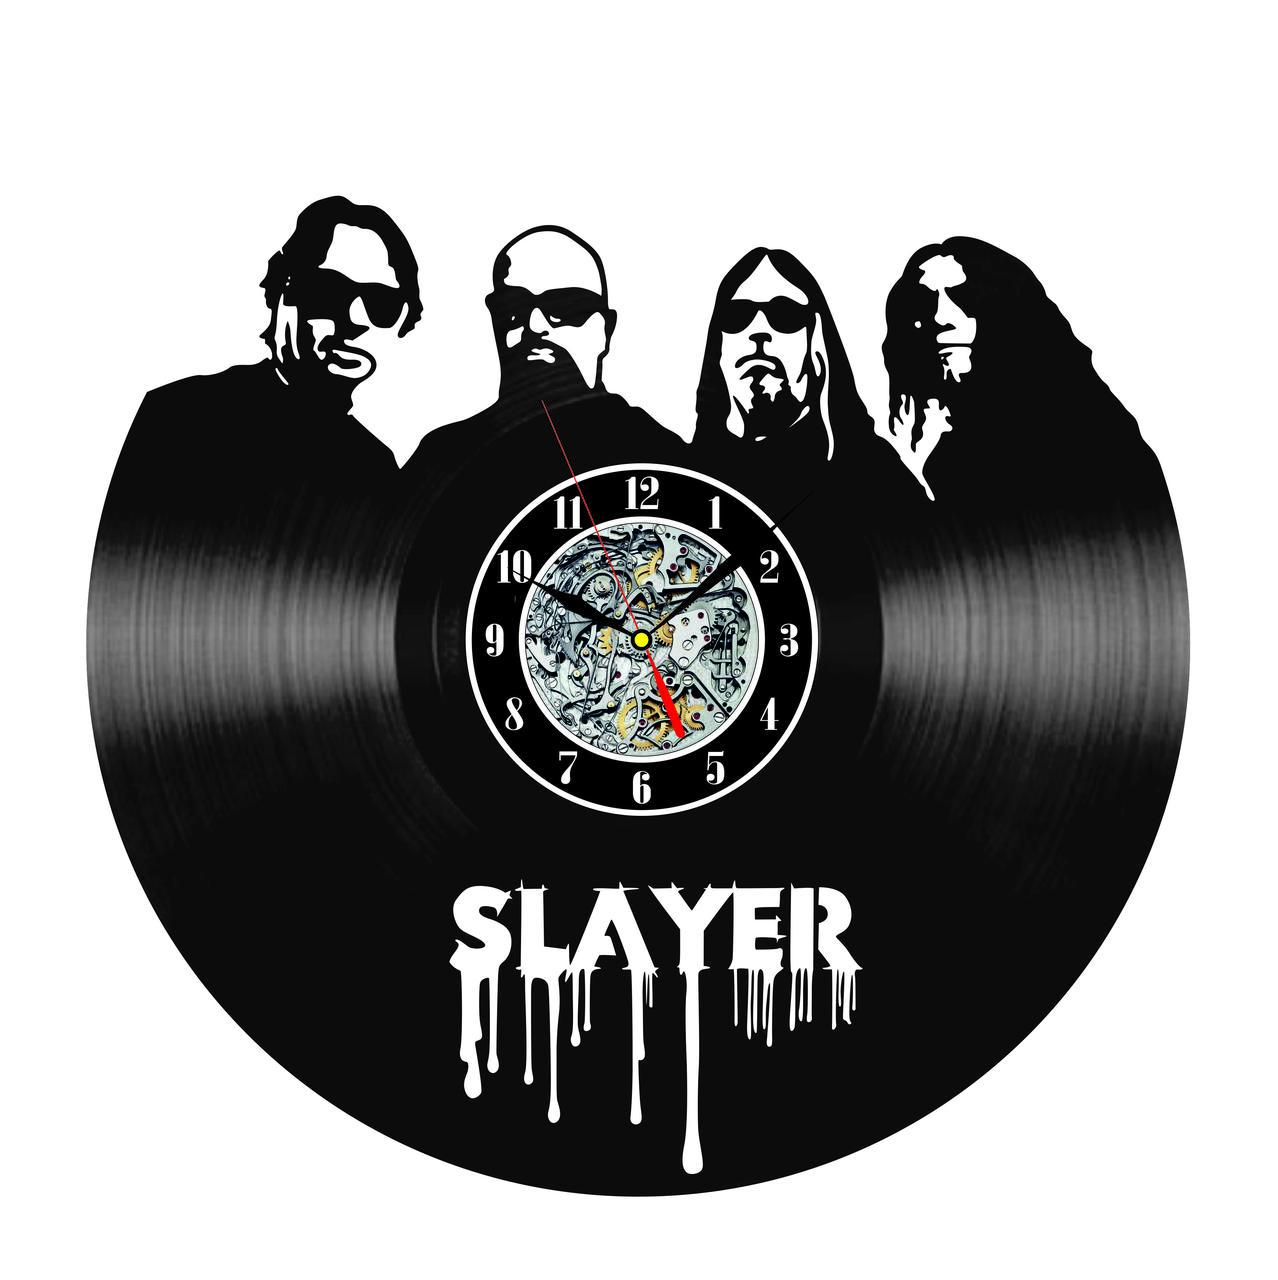 Настенные часы из виниловых пластинок LikeMark Slayer